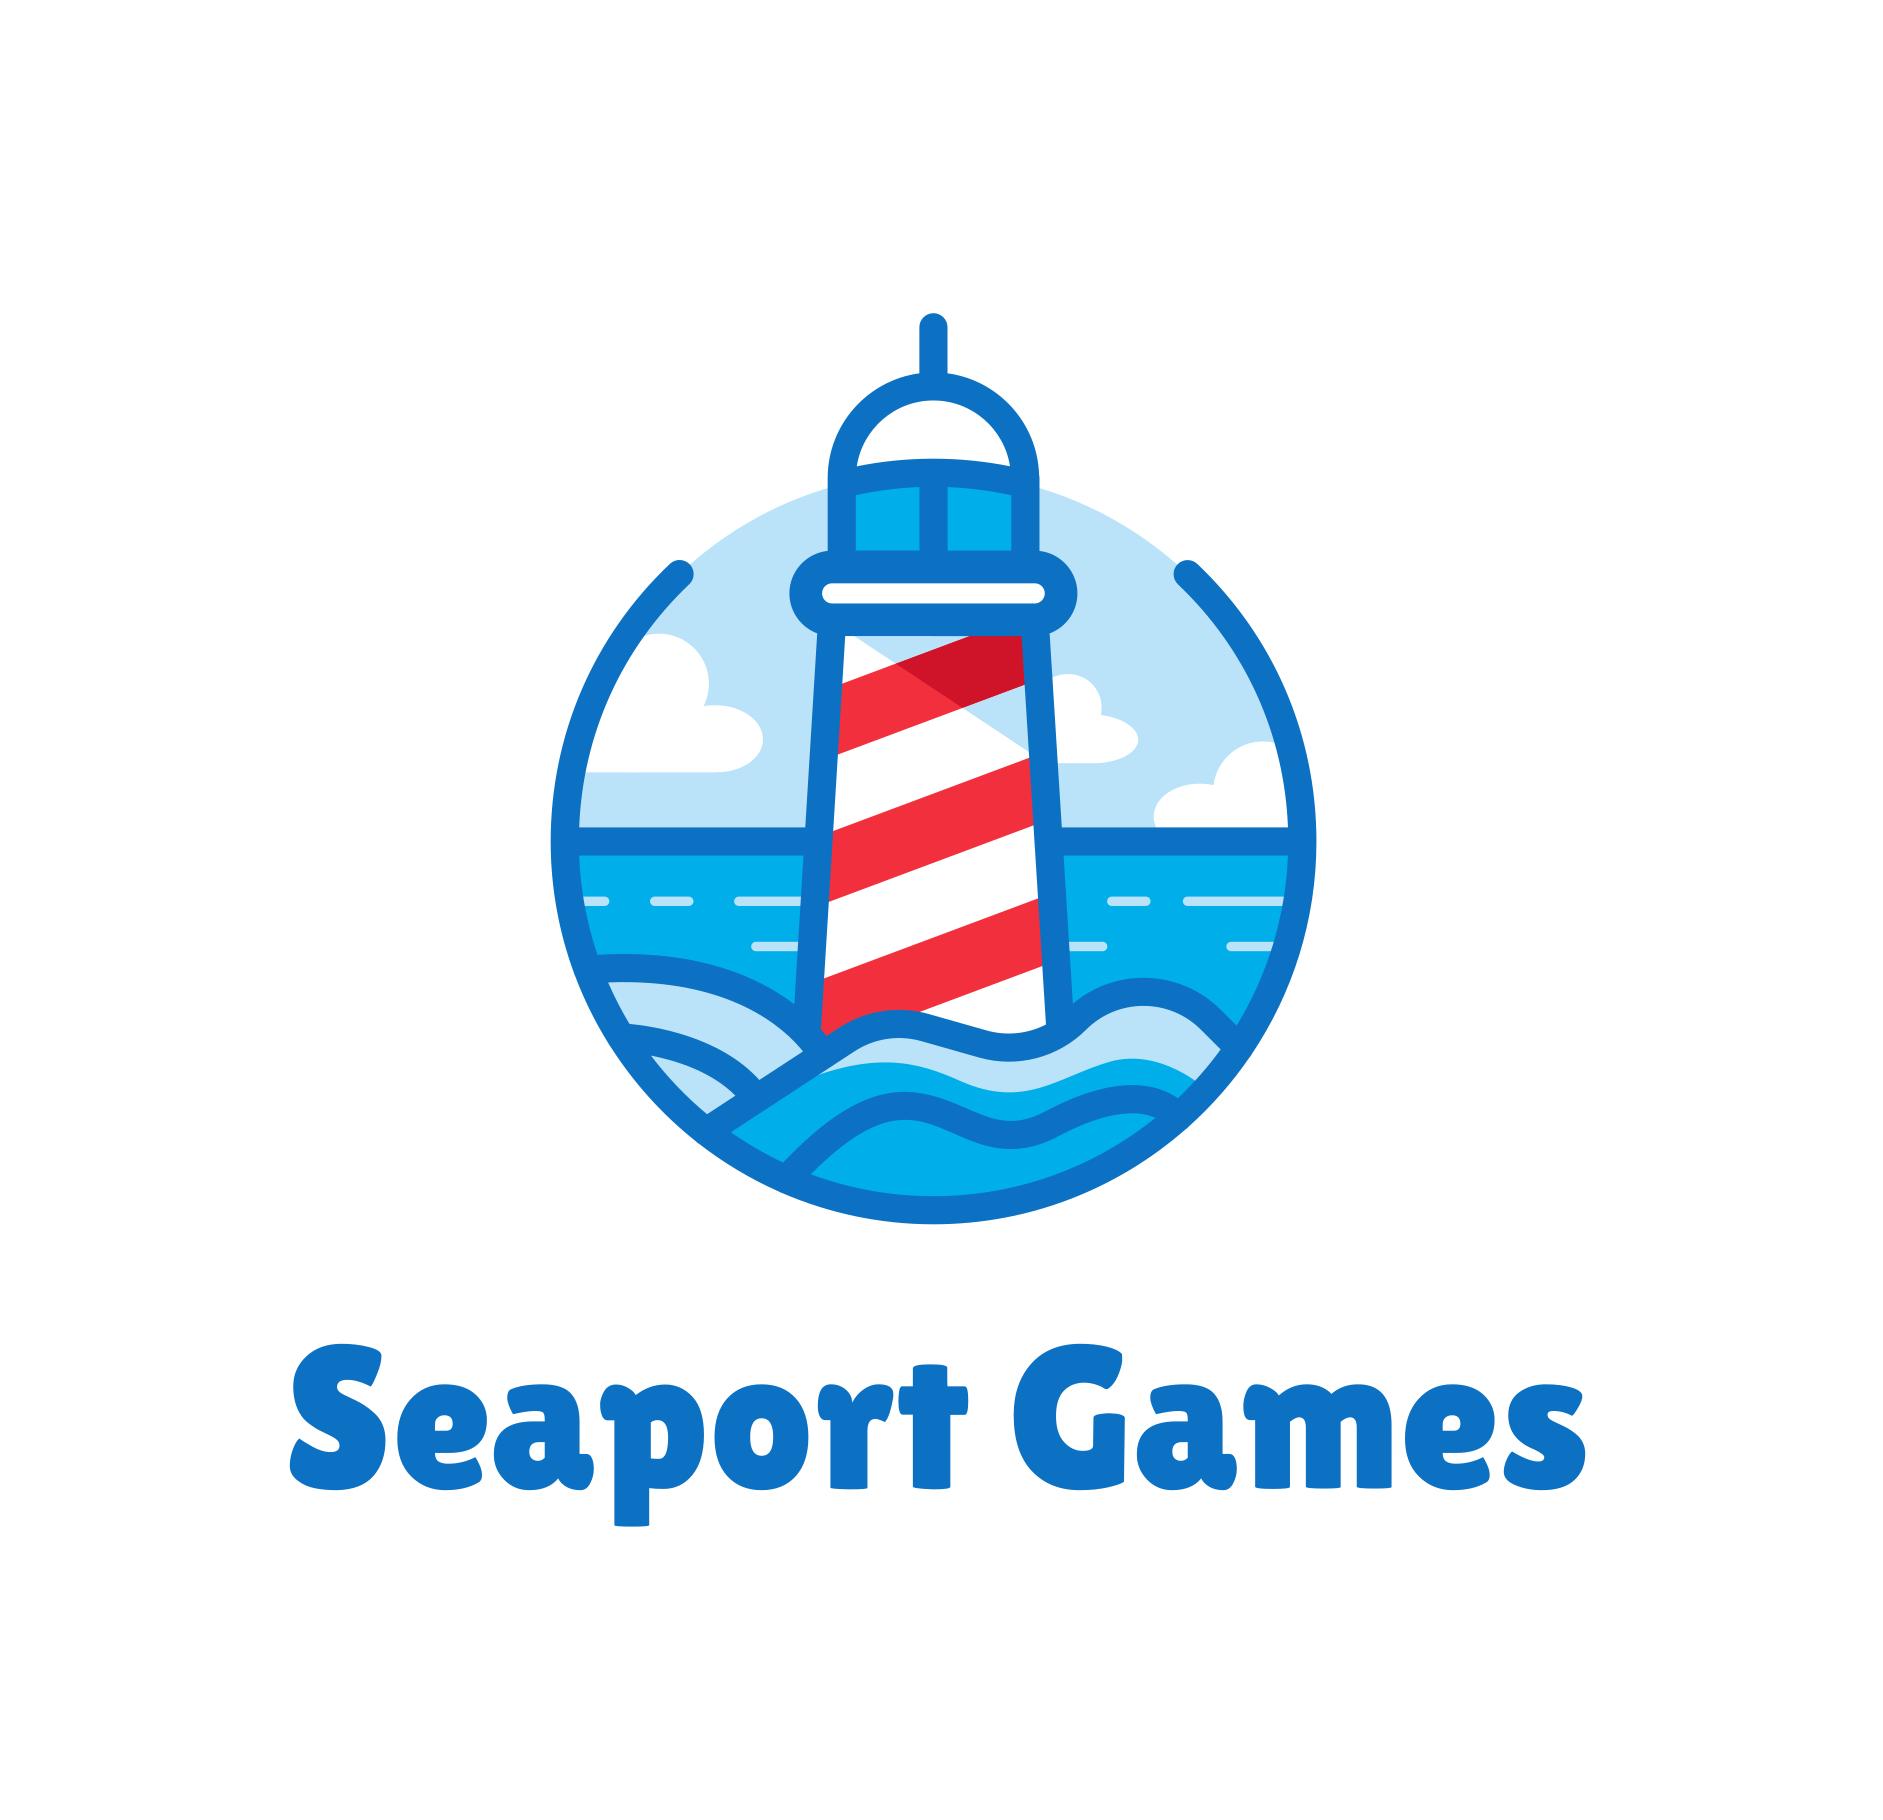 Seaport Games